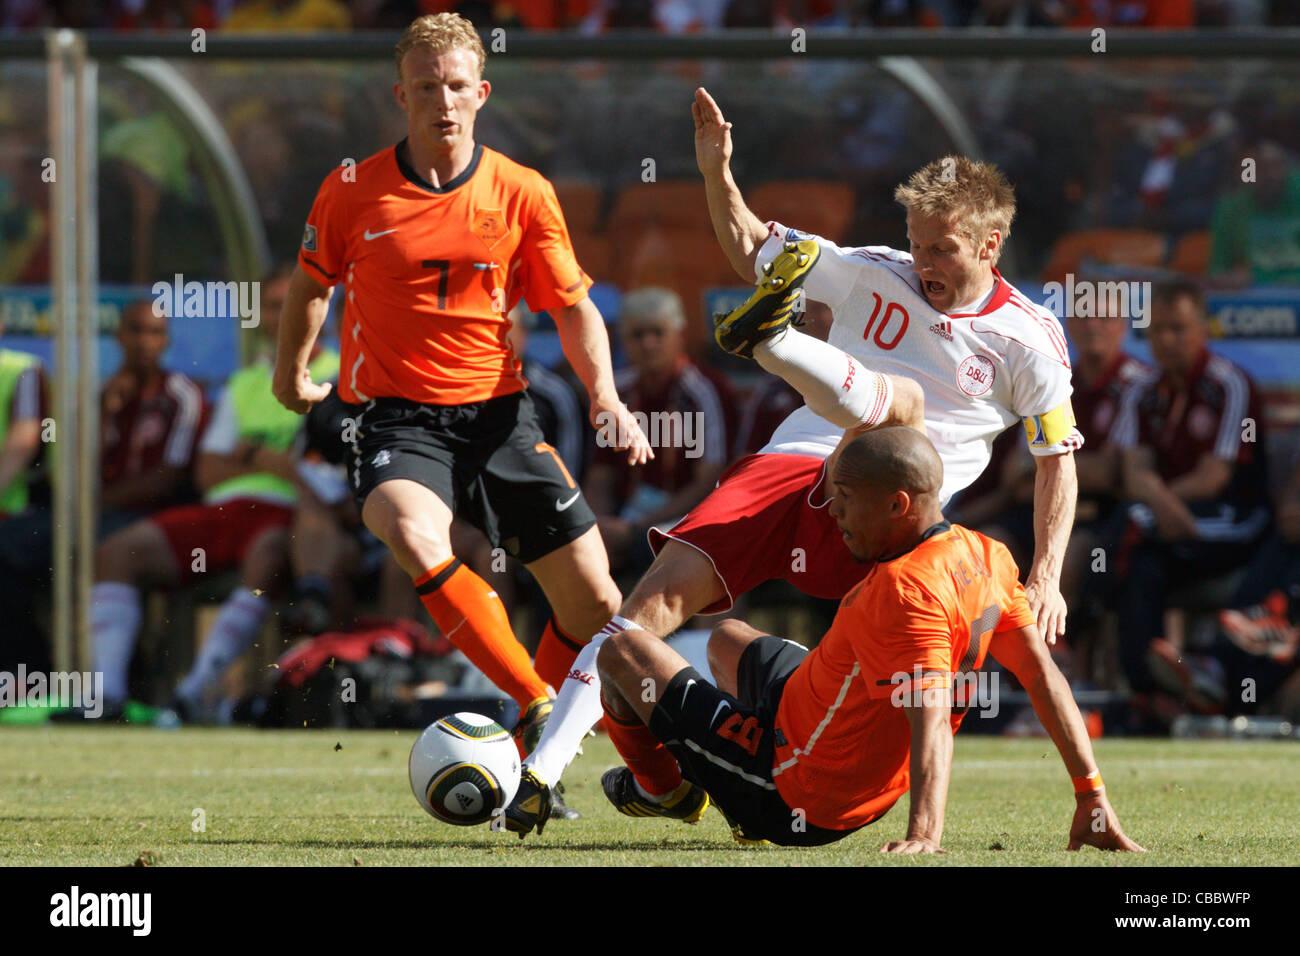 Nigel de Jong of the Netherlands tackles Martin Jorgensen of Denmark (10) during a 2010 FIFA World Cup match. Stock Photo